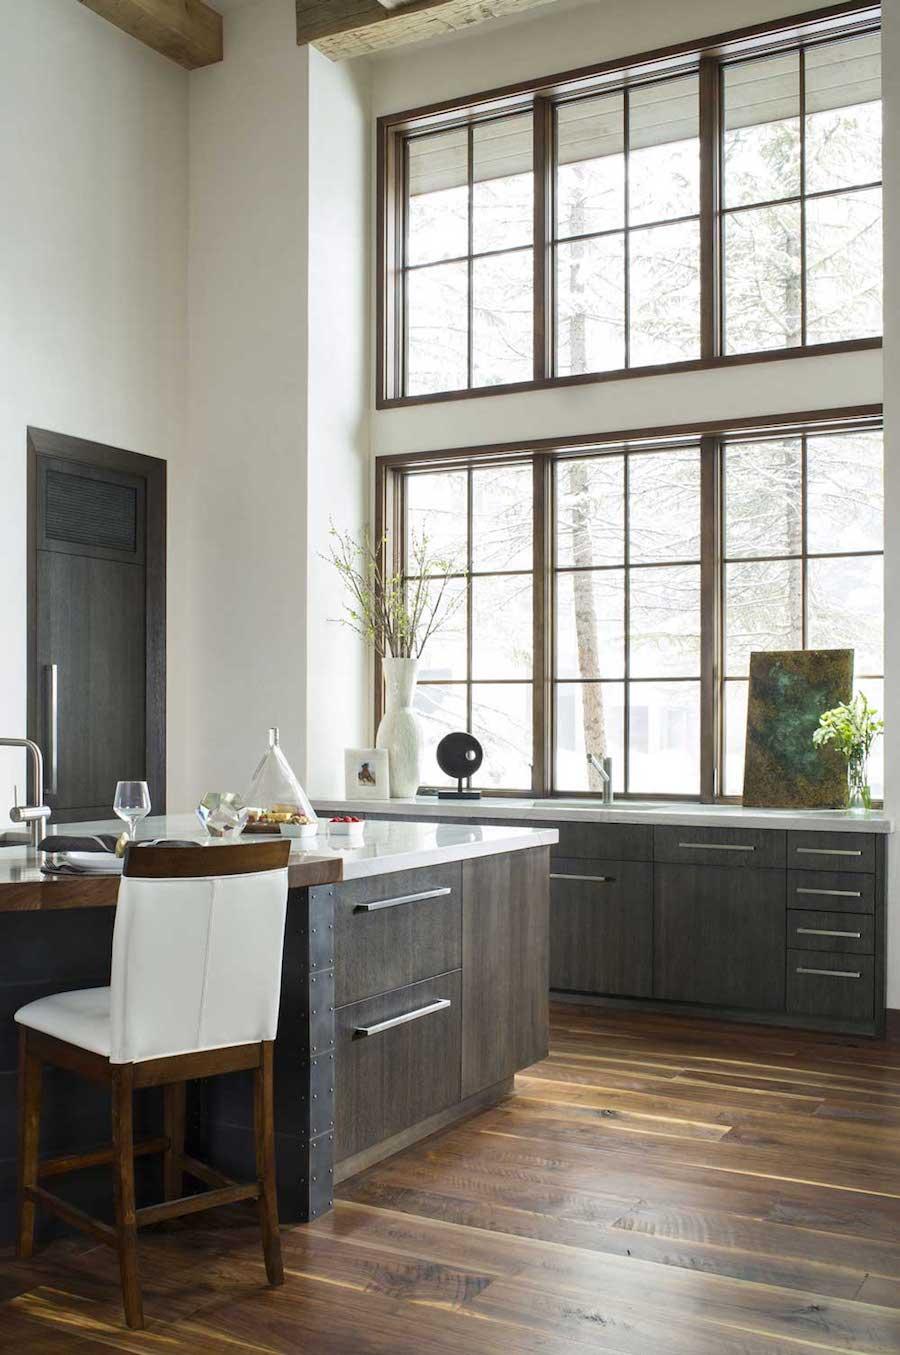 BeaverDam02  Exquisite Kitchen Design